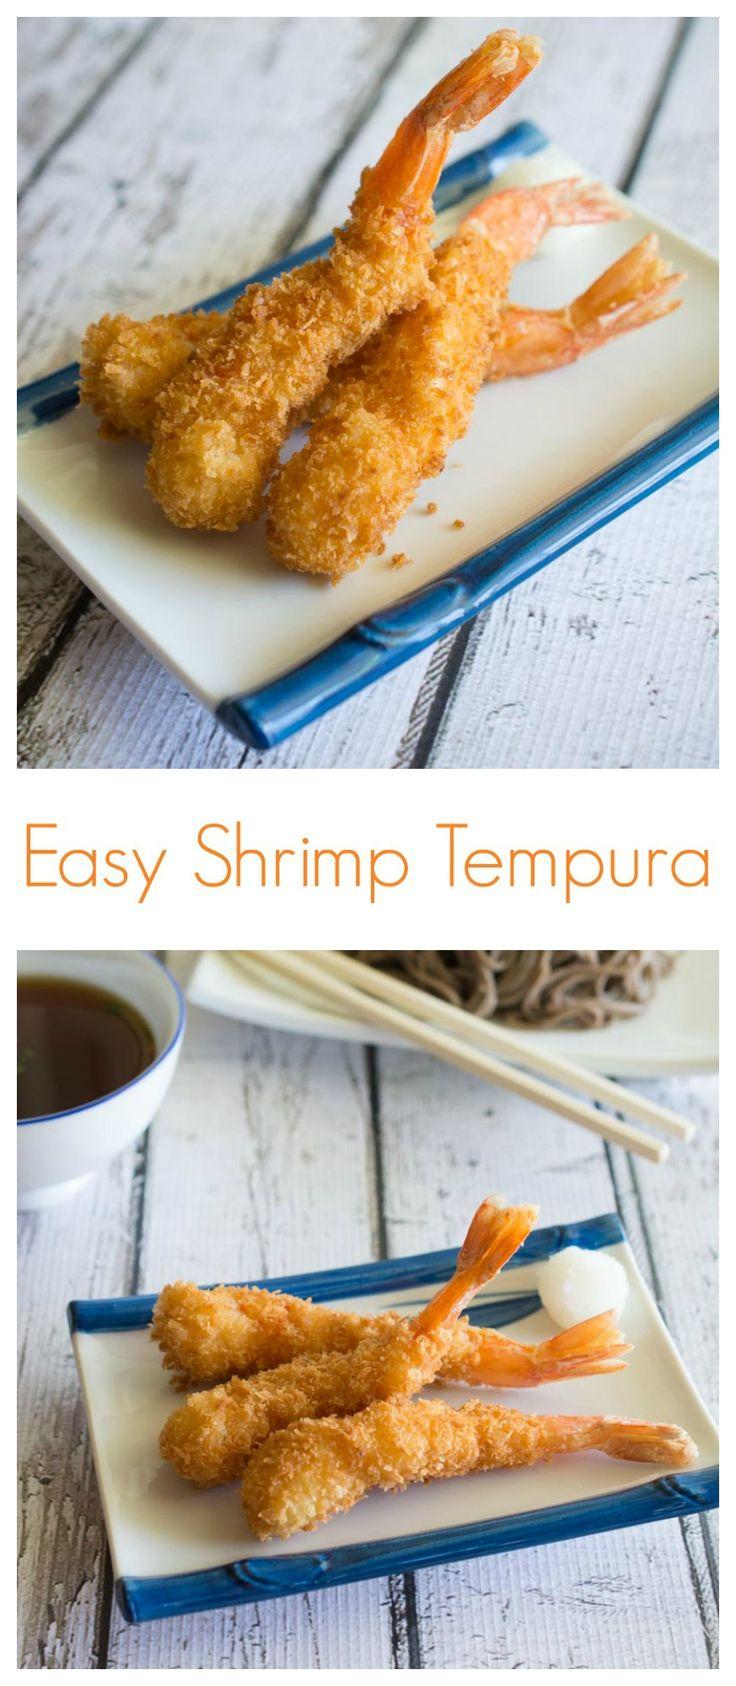 Easy Shrimp Tempura